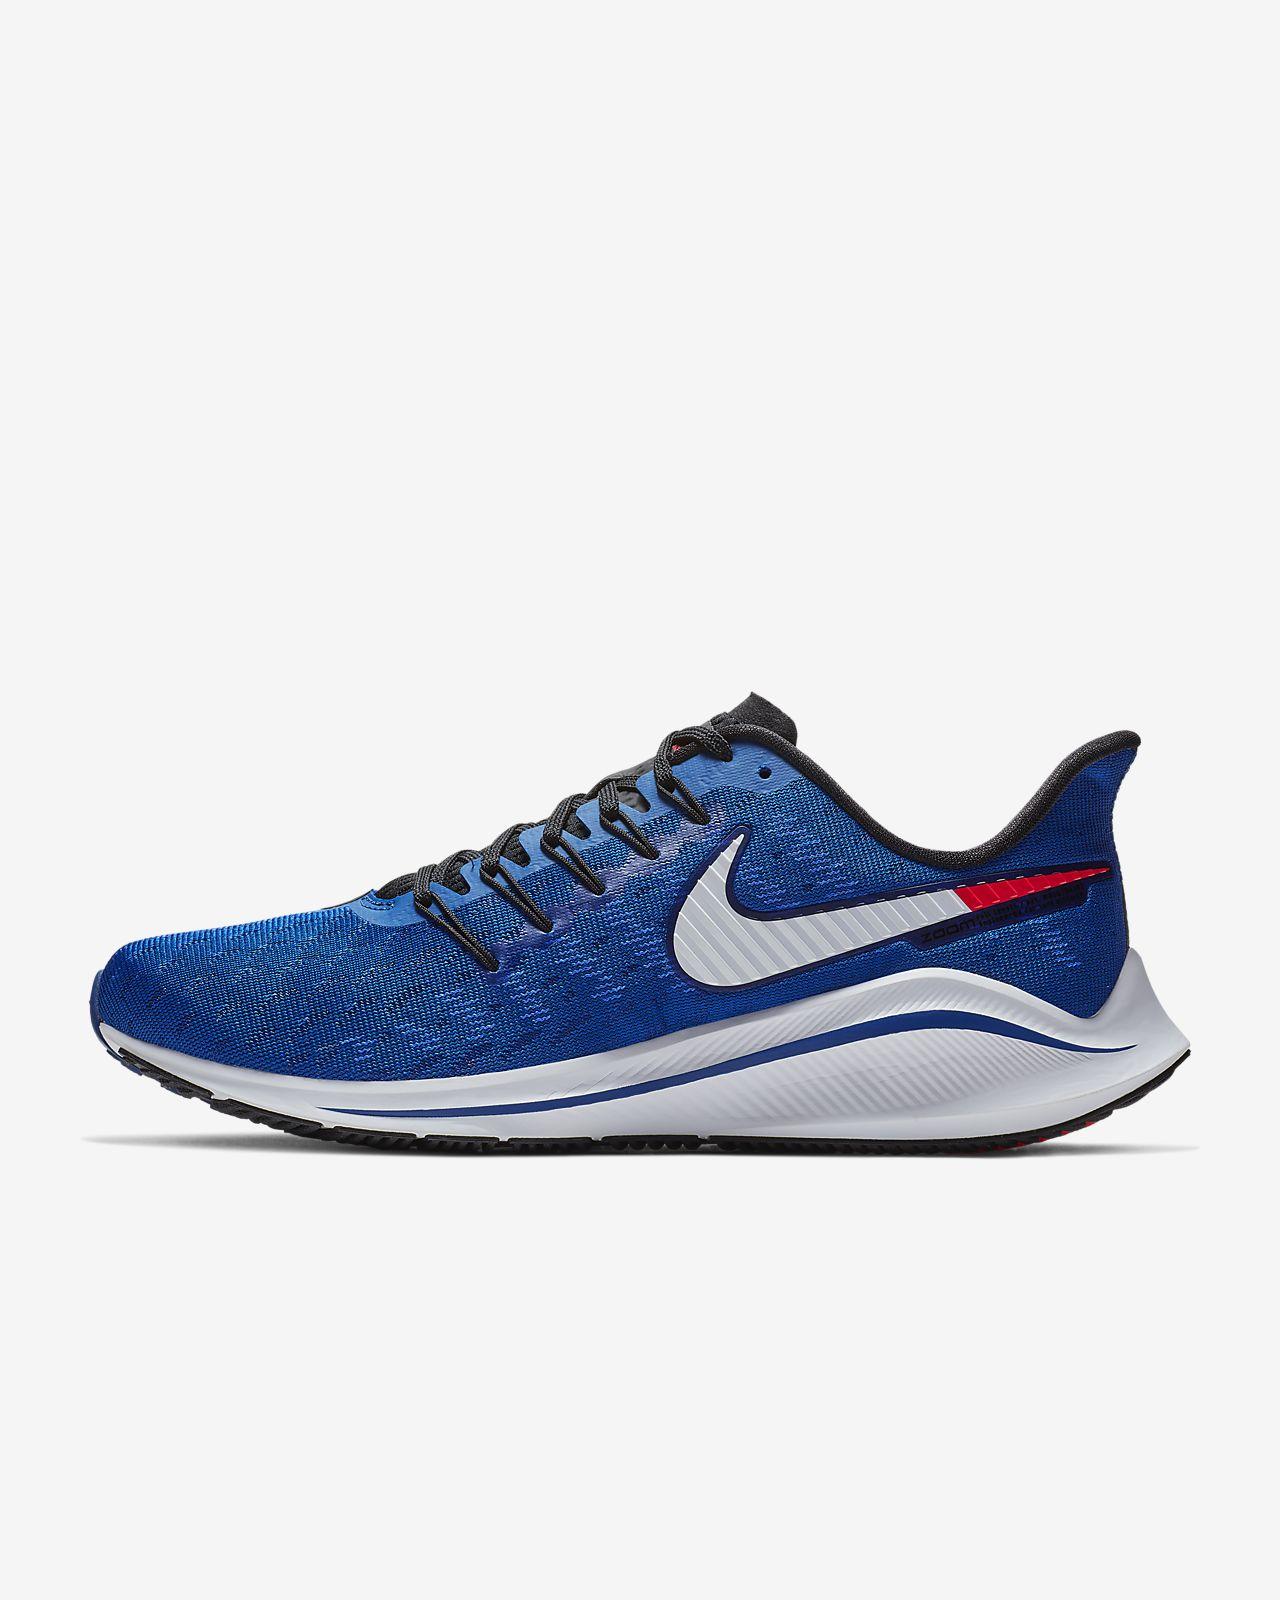 premium selection 02443 836cc Nike Air Zoom Vomero 14 løpesko til herre